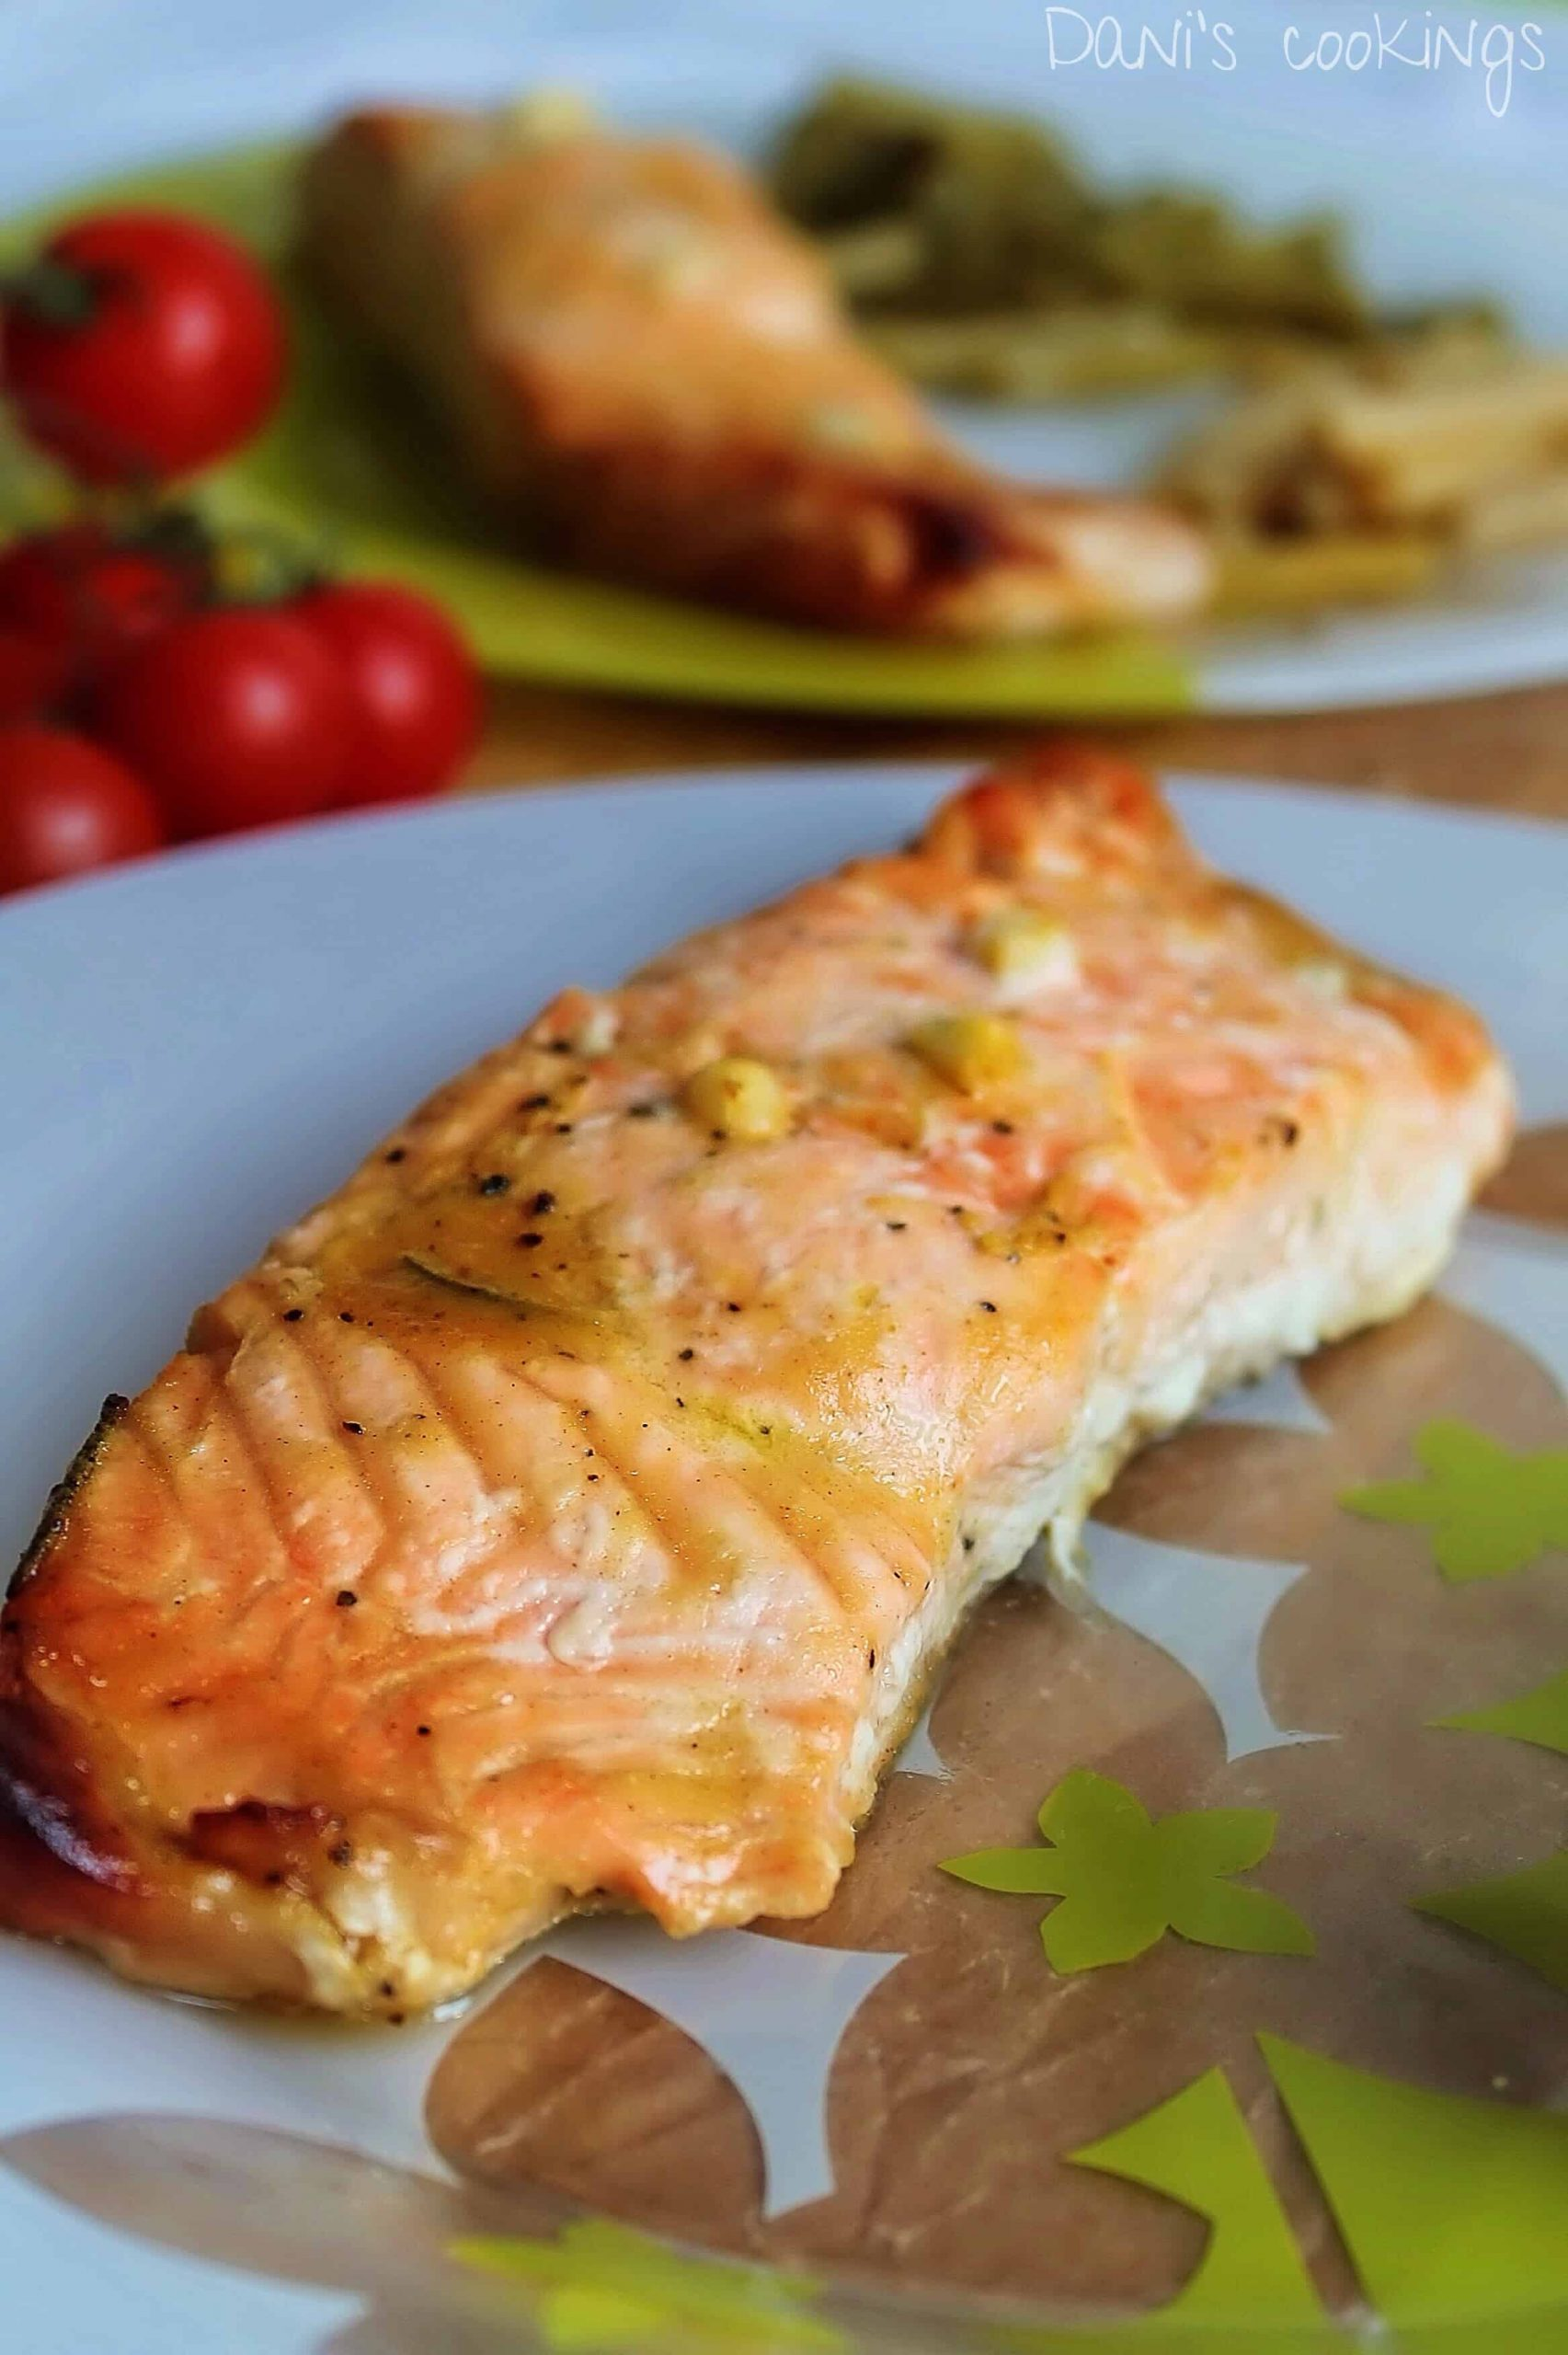 Honey Mustard salmon - daniscookings.com